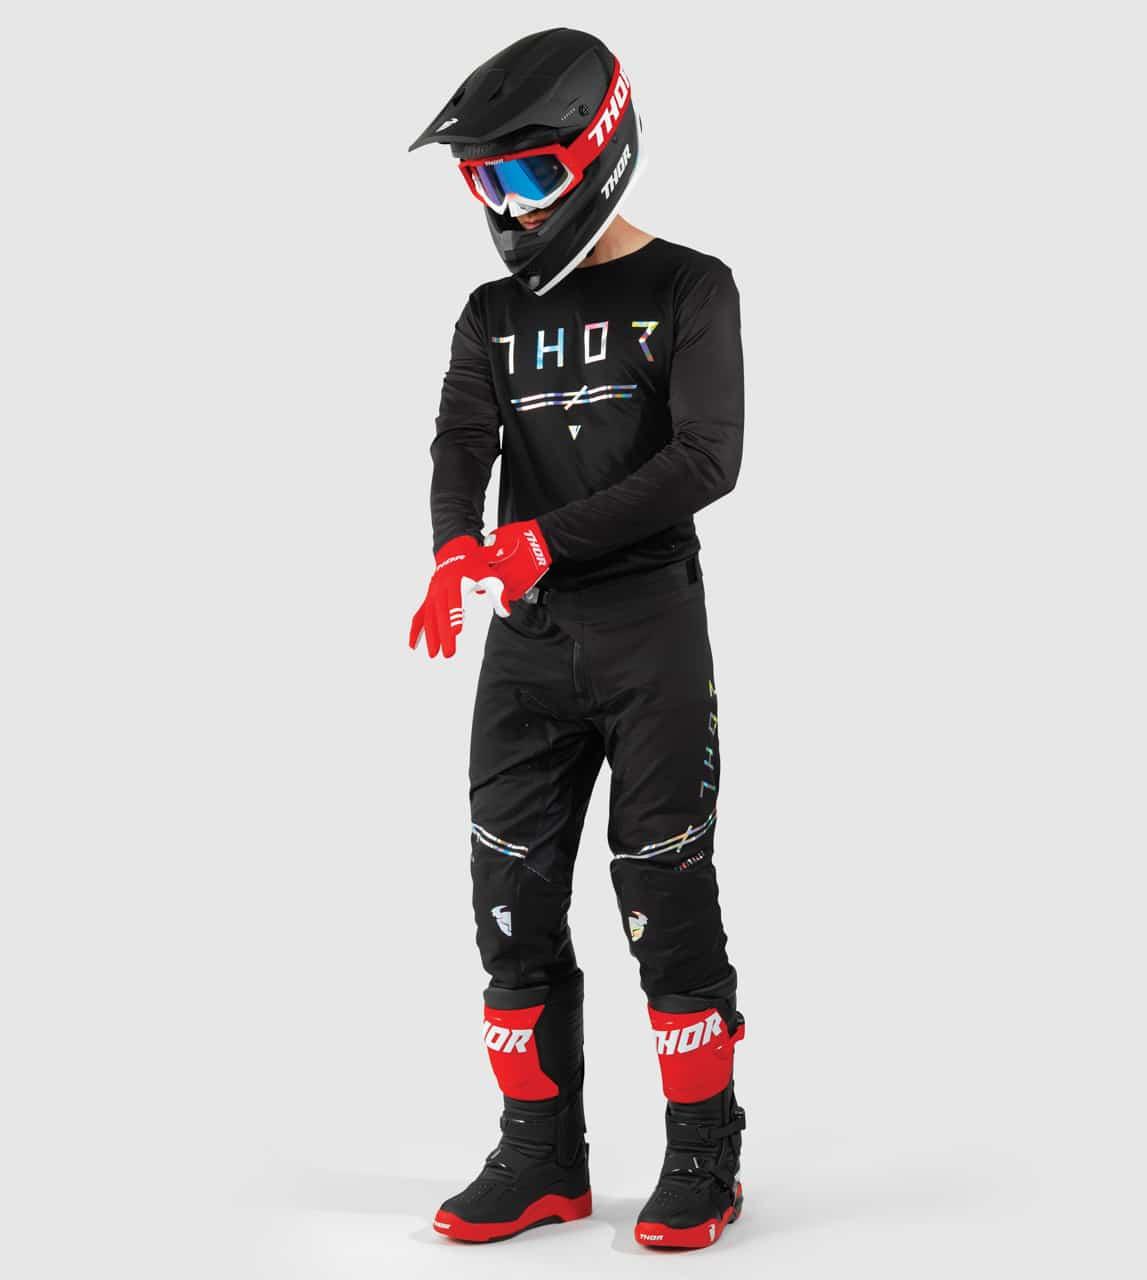 THOR MX 2021 PRIME PEO